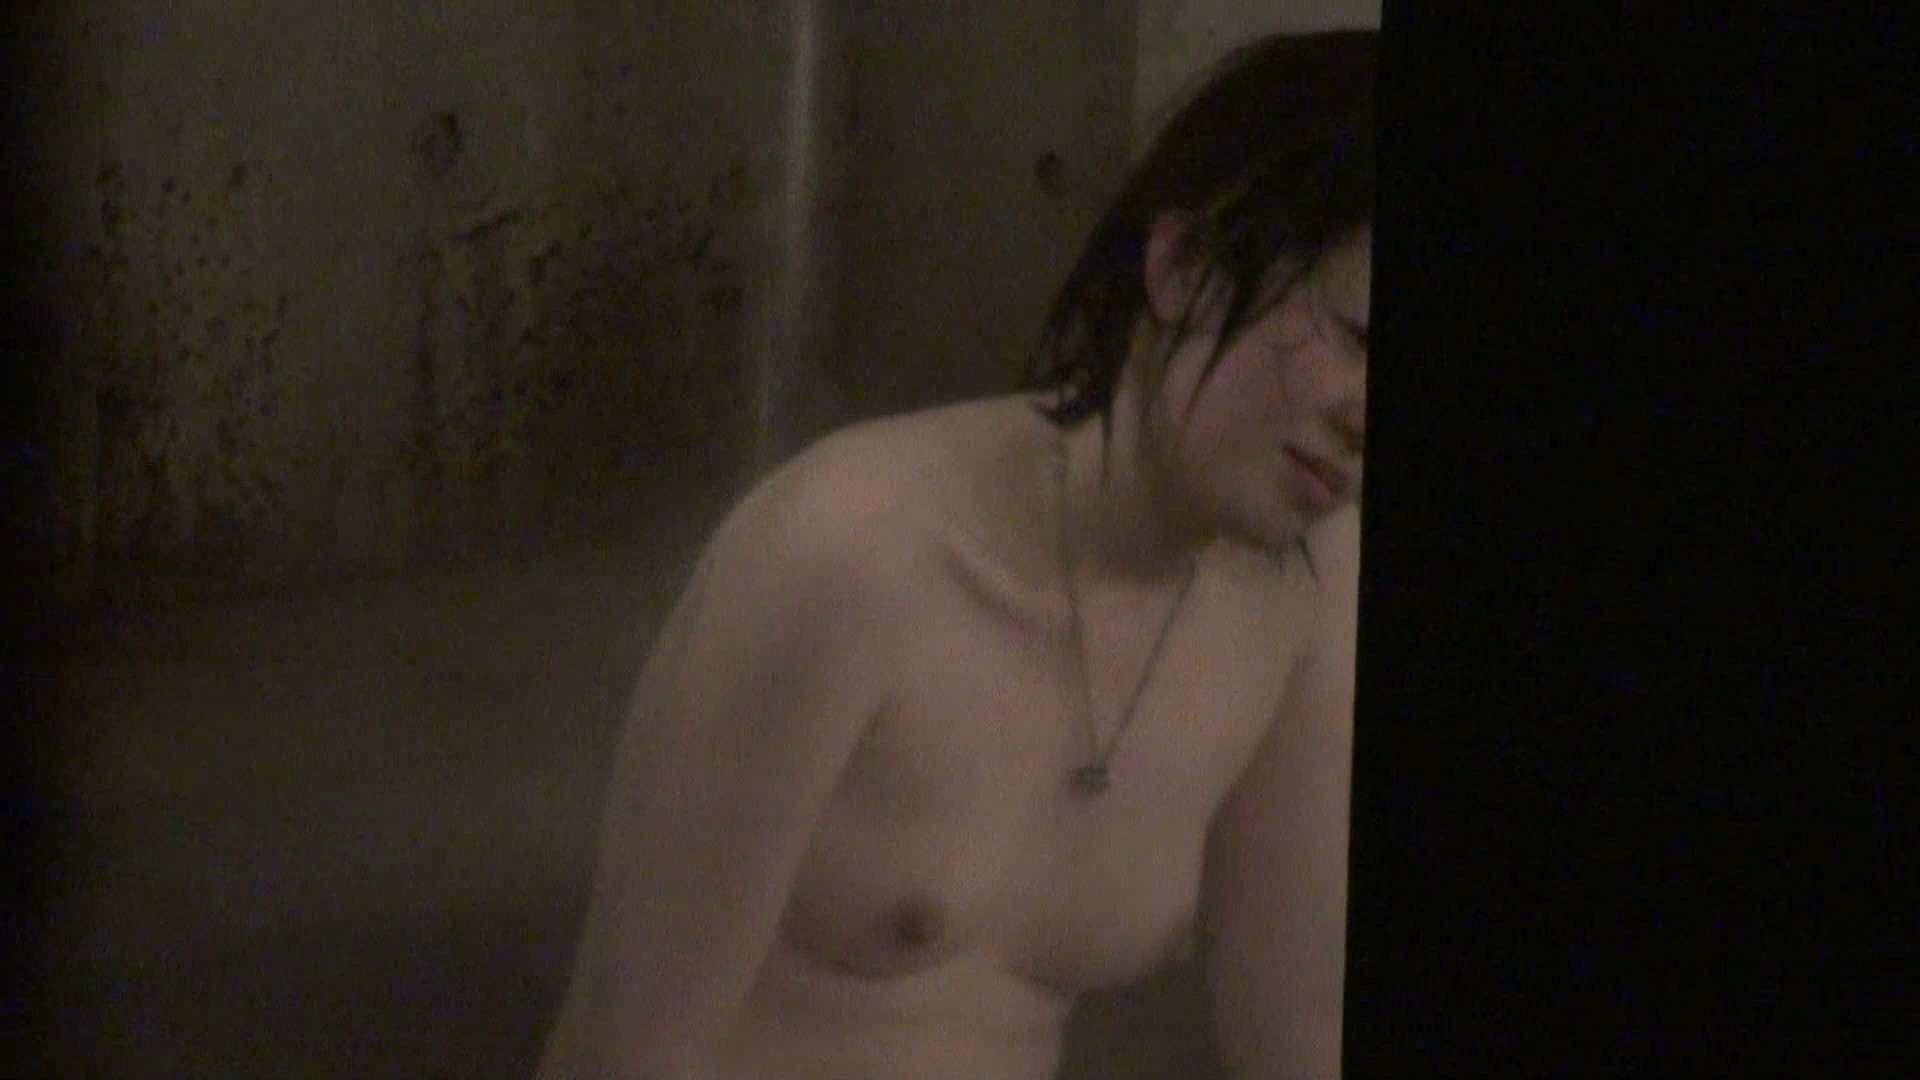 Aquaな露天風呂Vol.376 盗撮 おまんこ動画流出 109連発 17